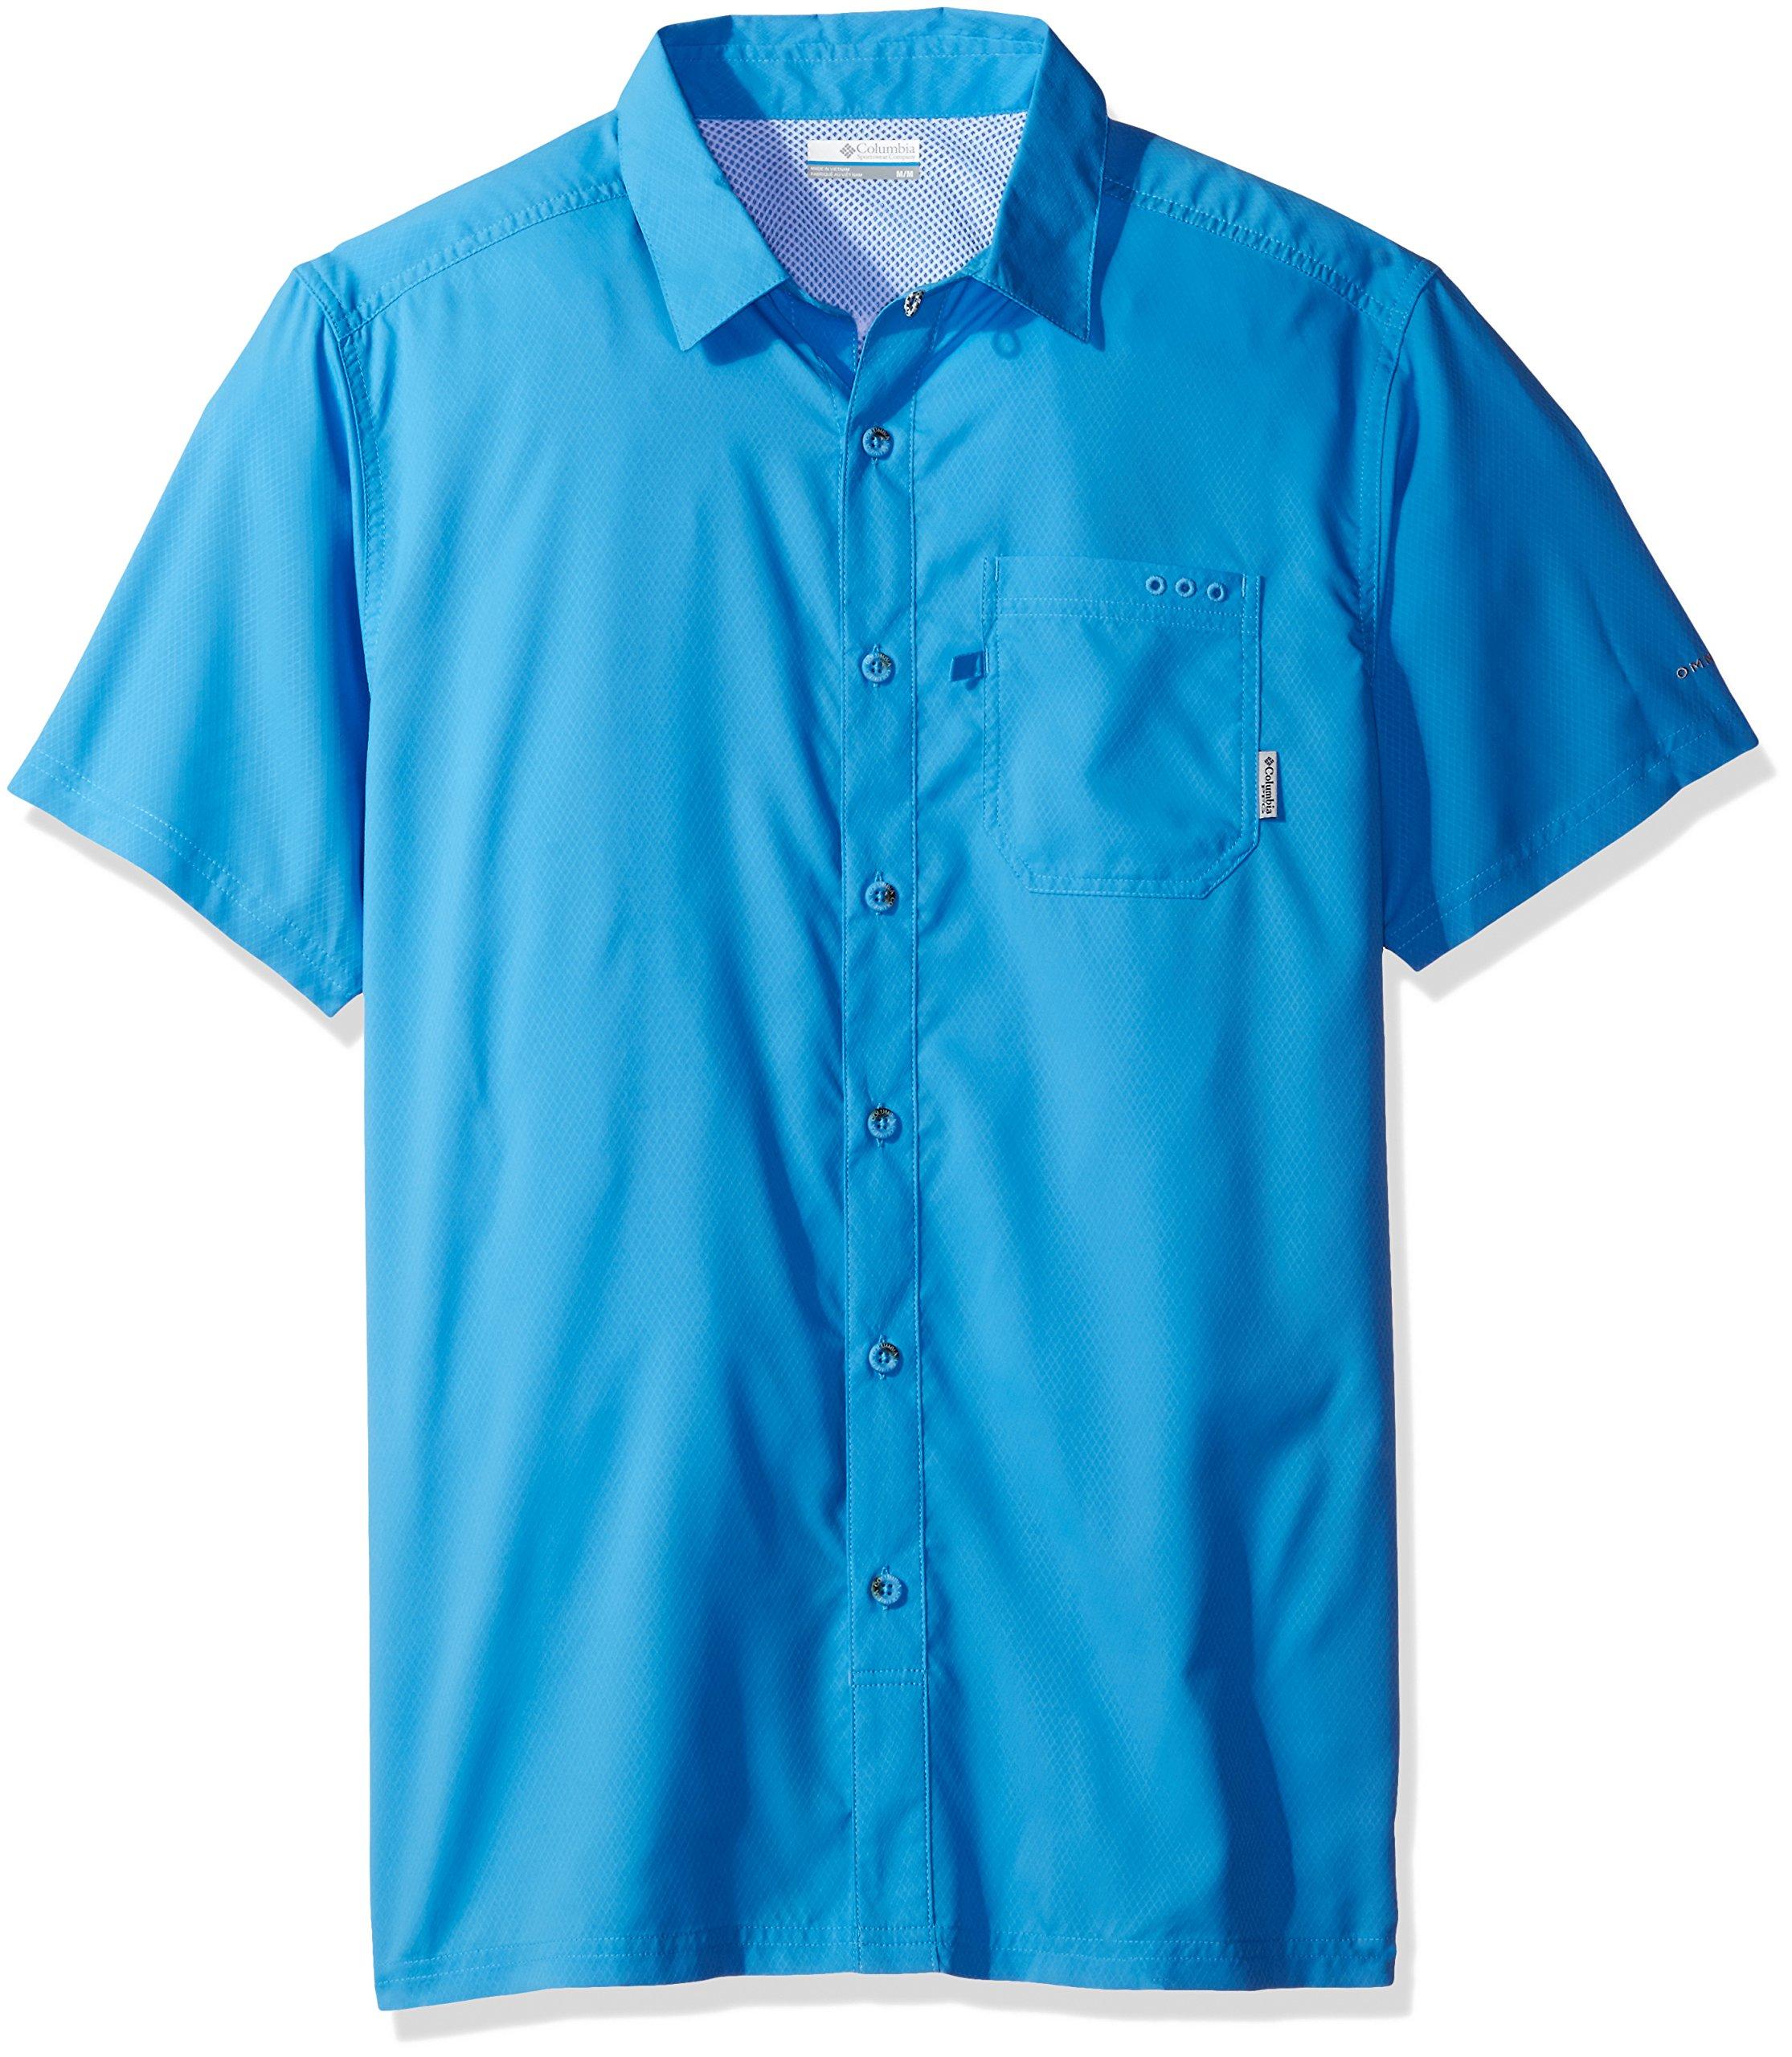 Columbia Men's Slack Tide Camp Shirt, Yacht, X-Large by Columbia